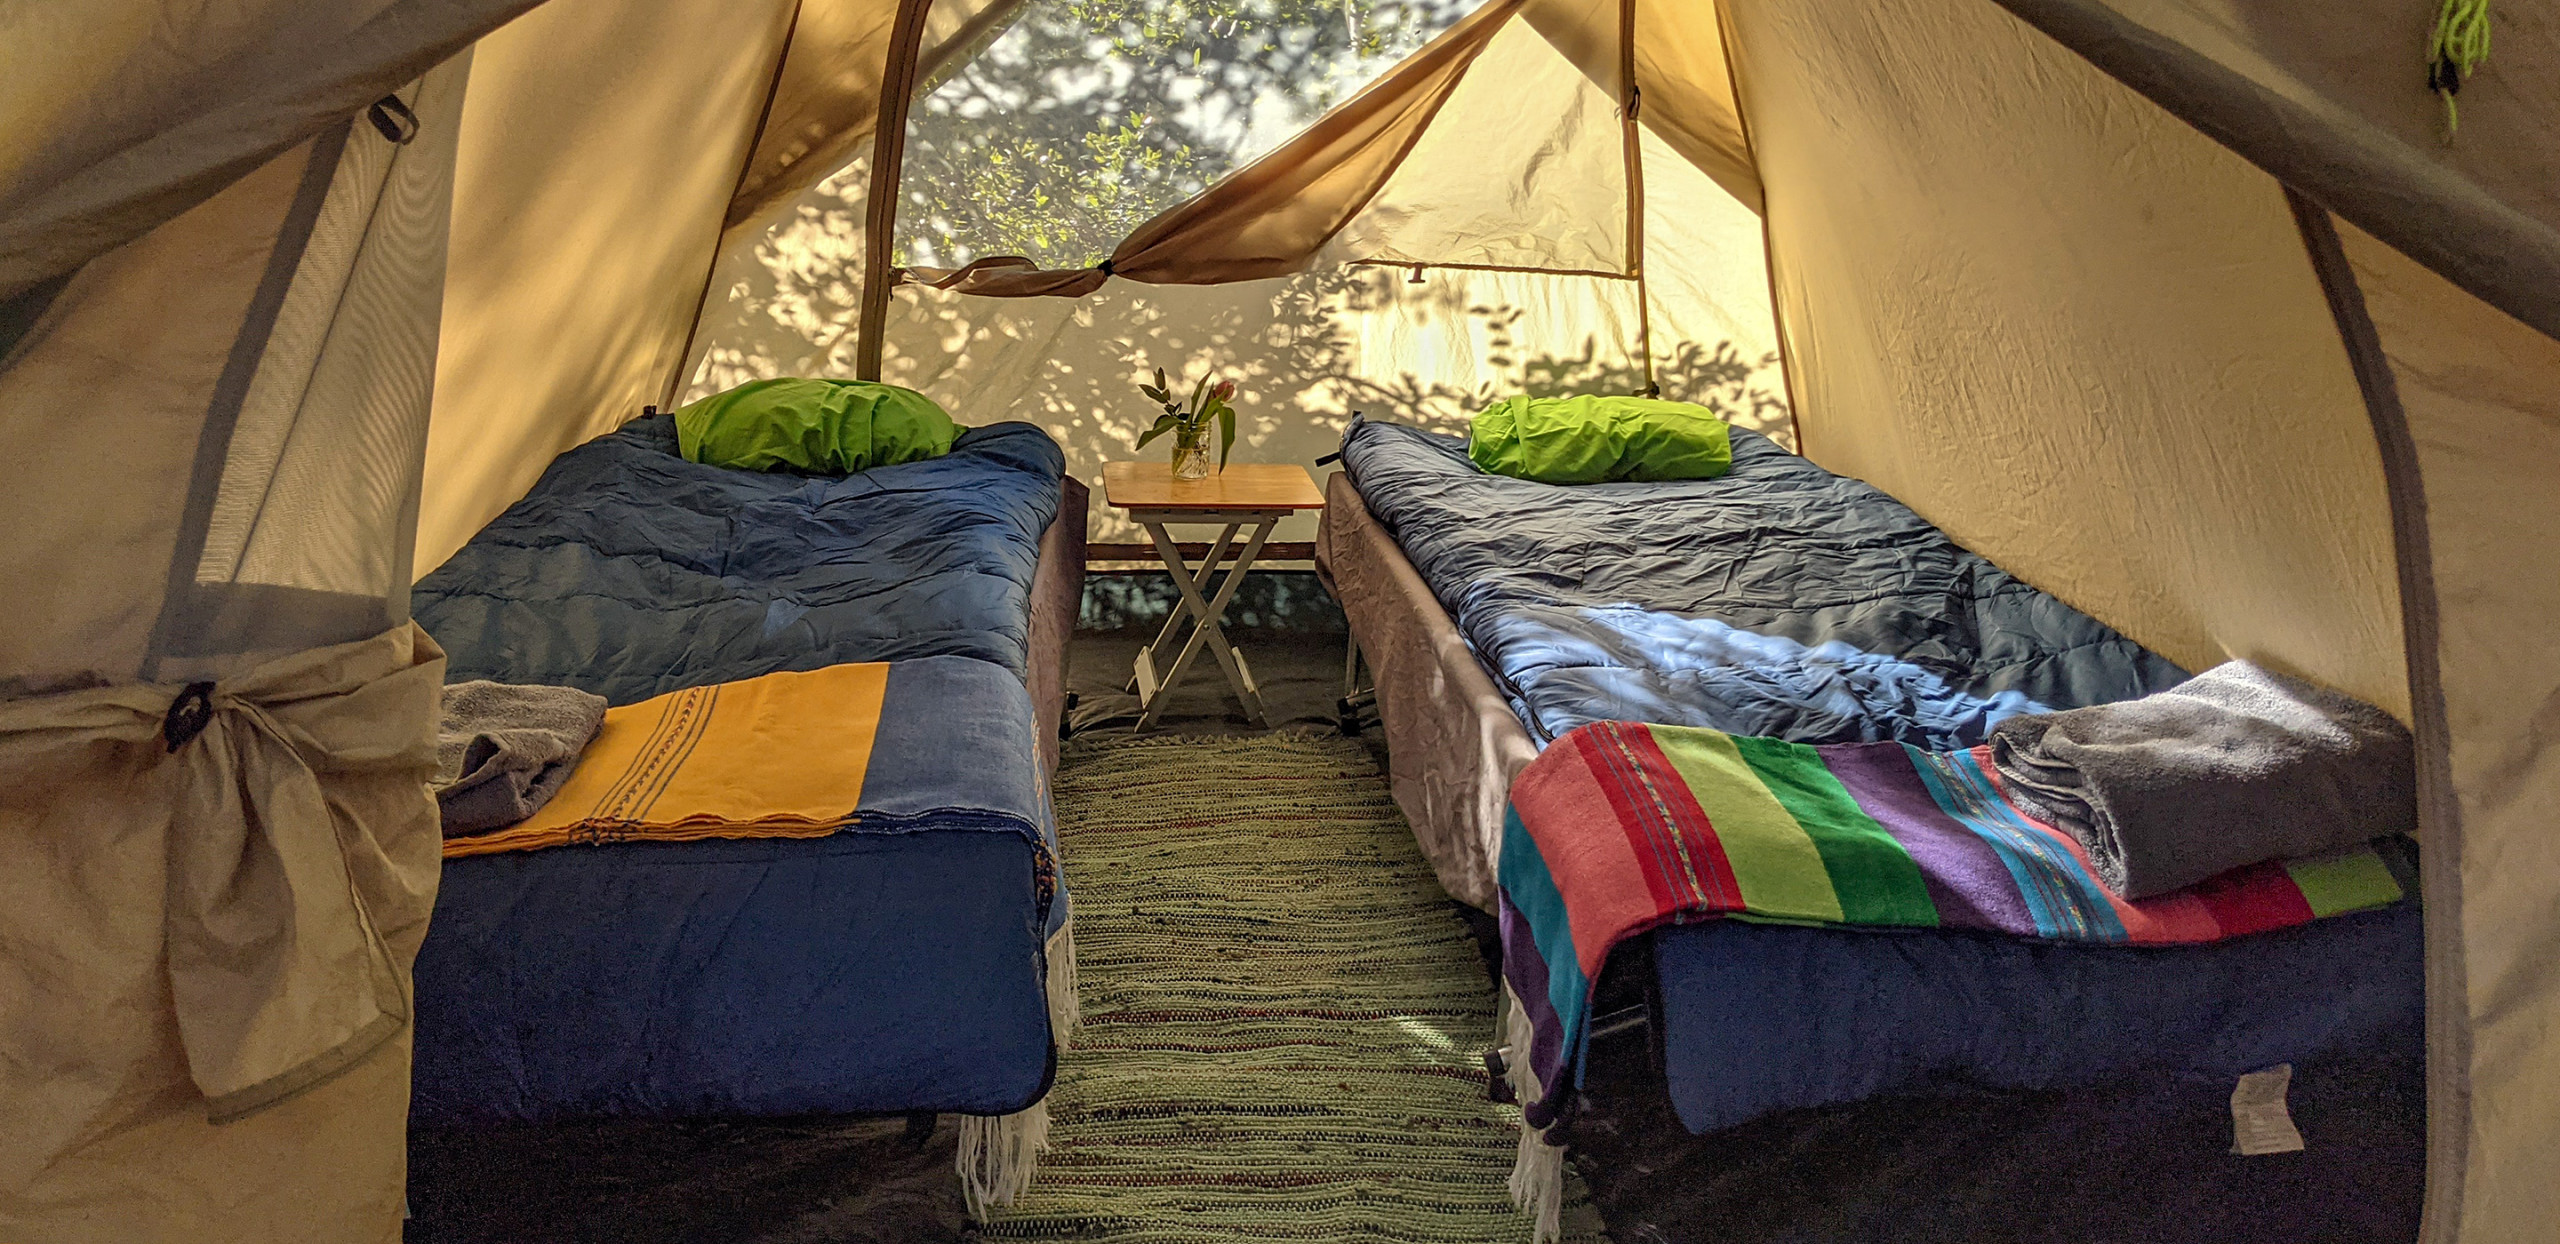 Rafting Glamping Tent